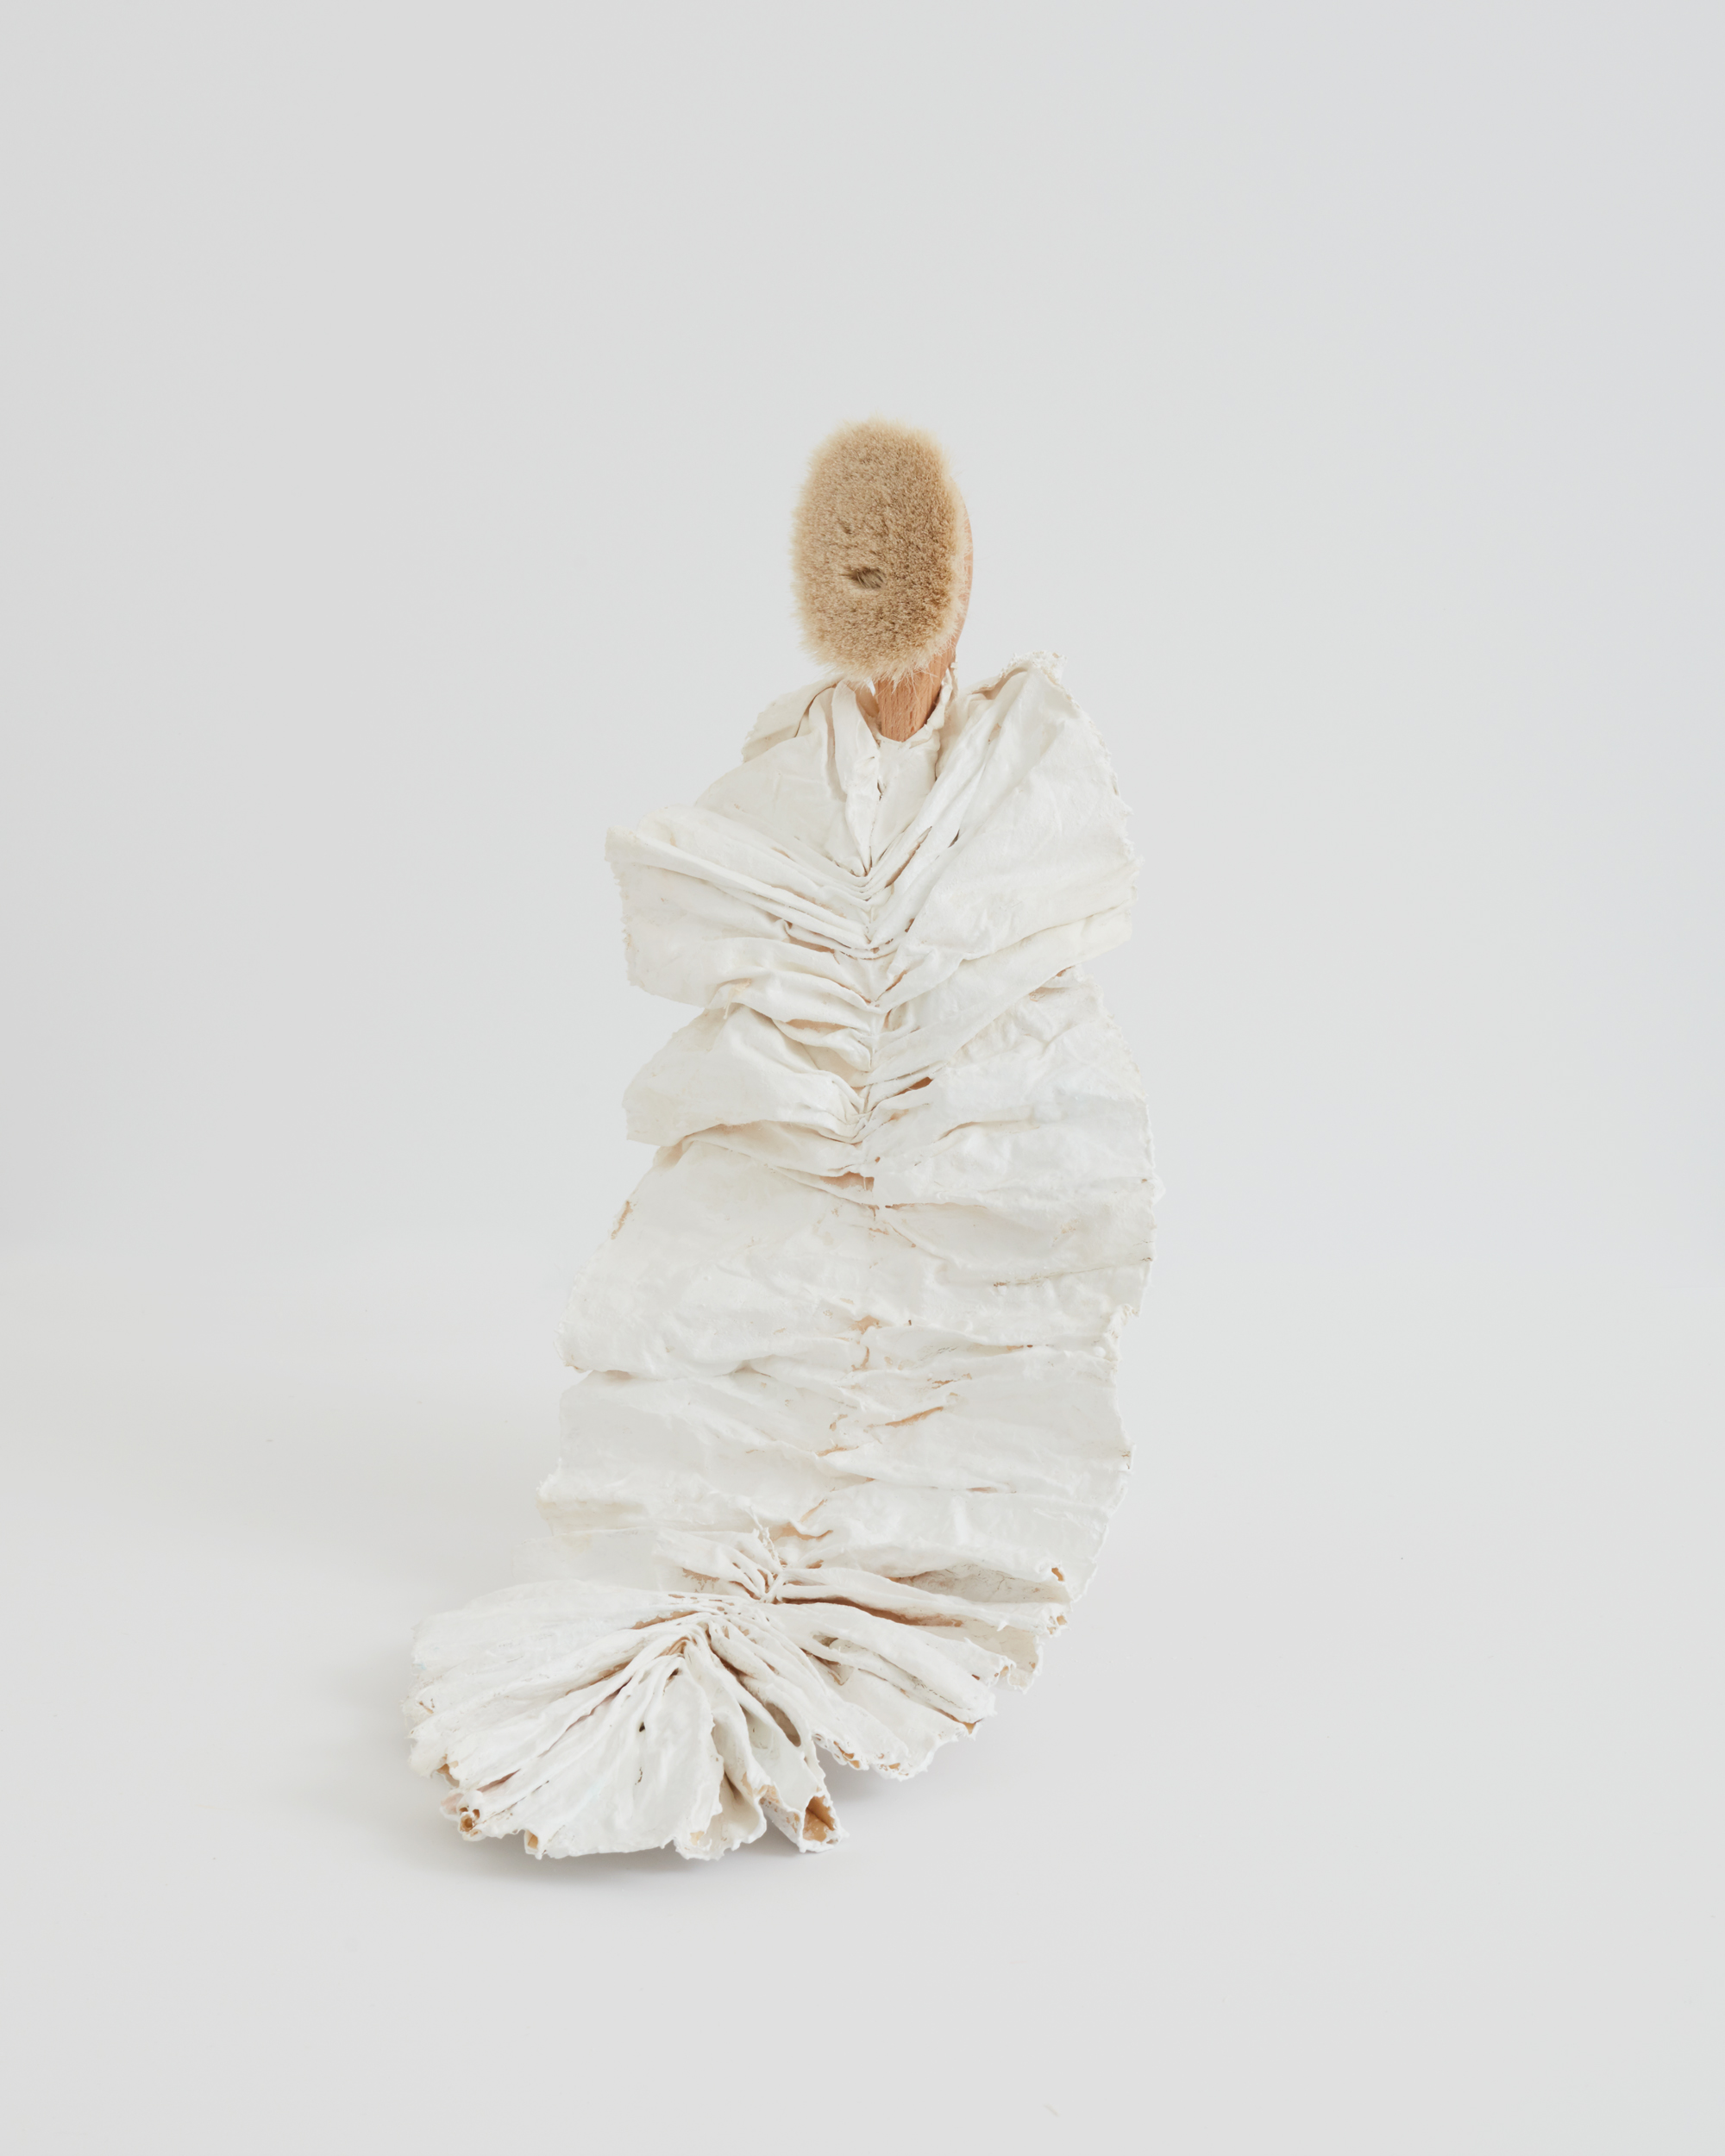 Maryam Keyhani, Ruffled_Plaster, foam, paint, hand-made brush_28x2153cm.JPG